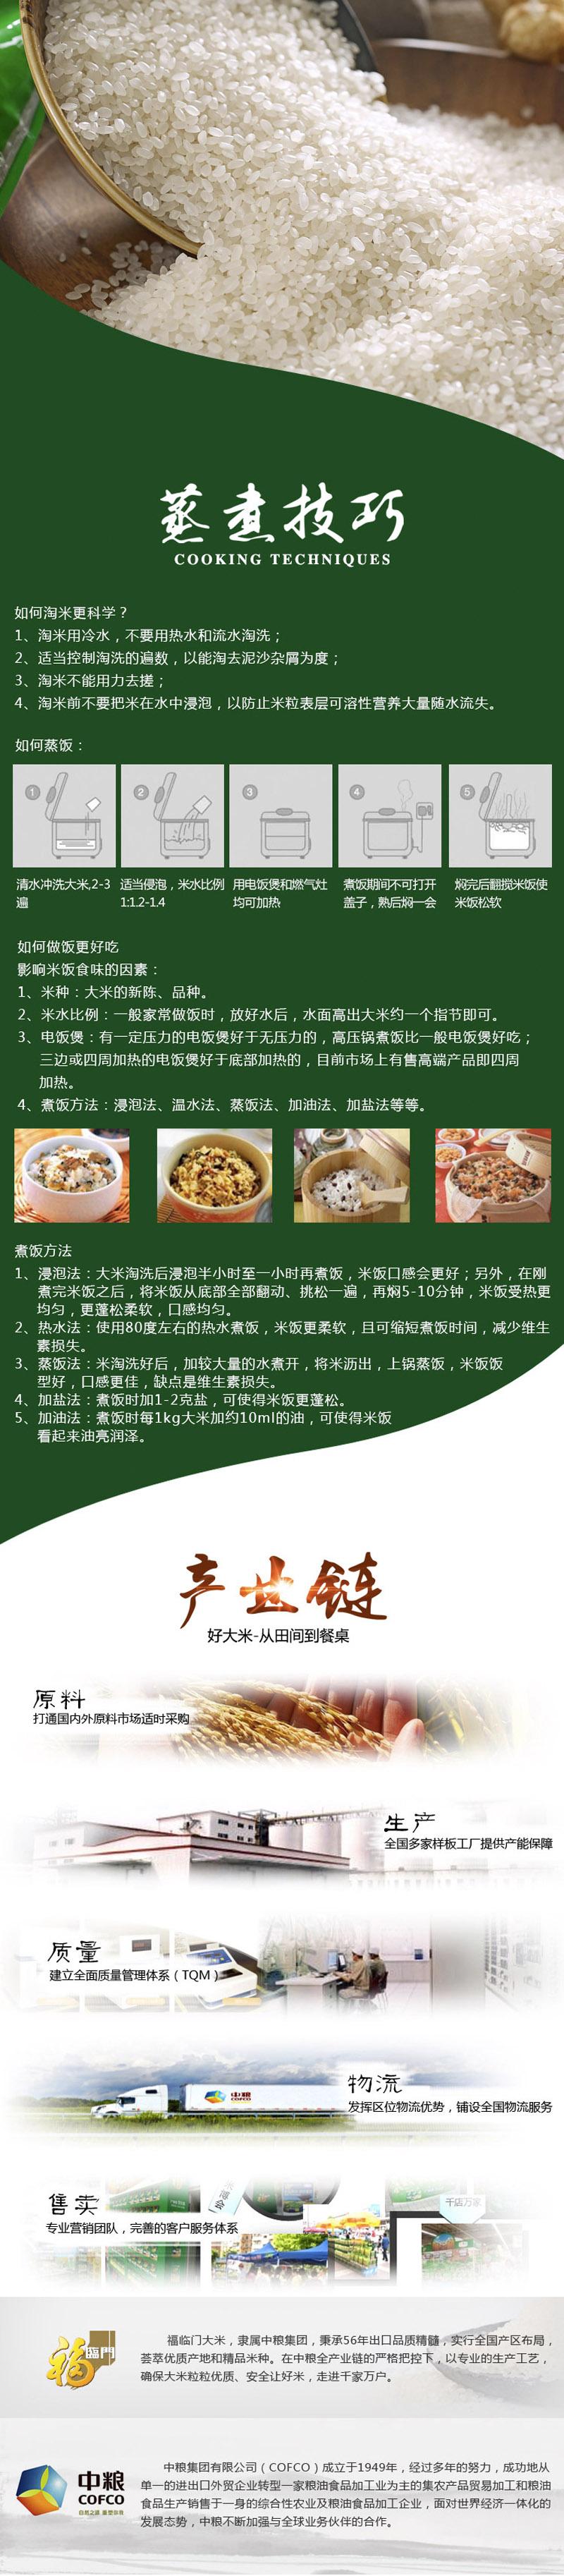 web-cofco-rice-6.jpg